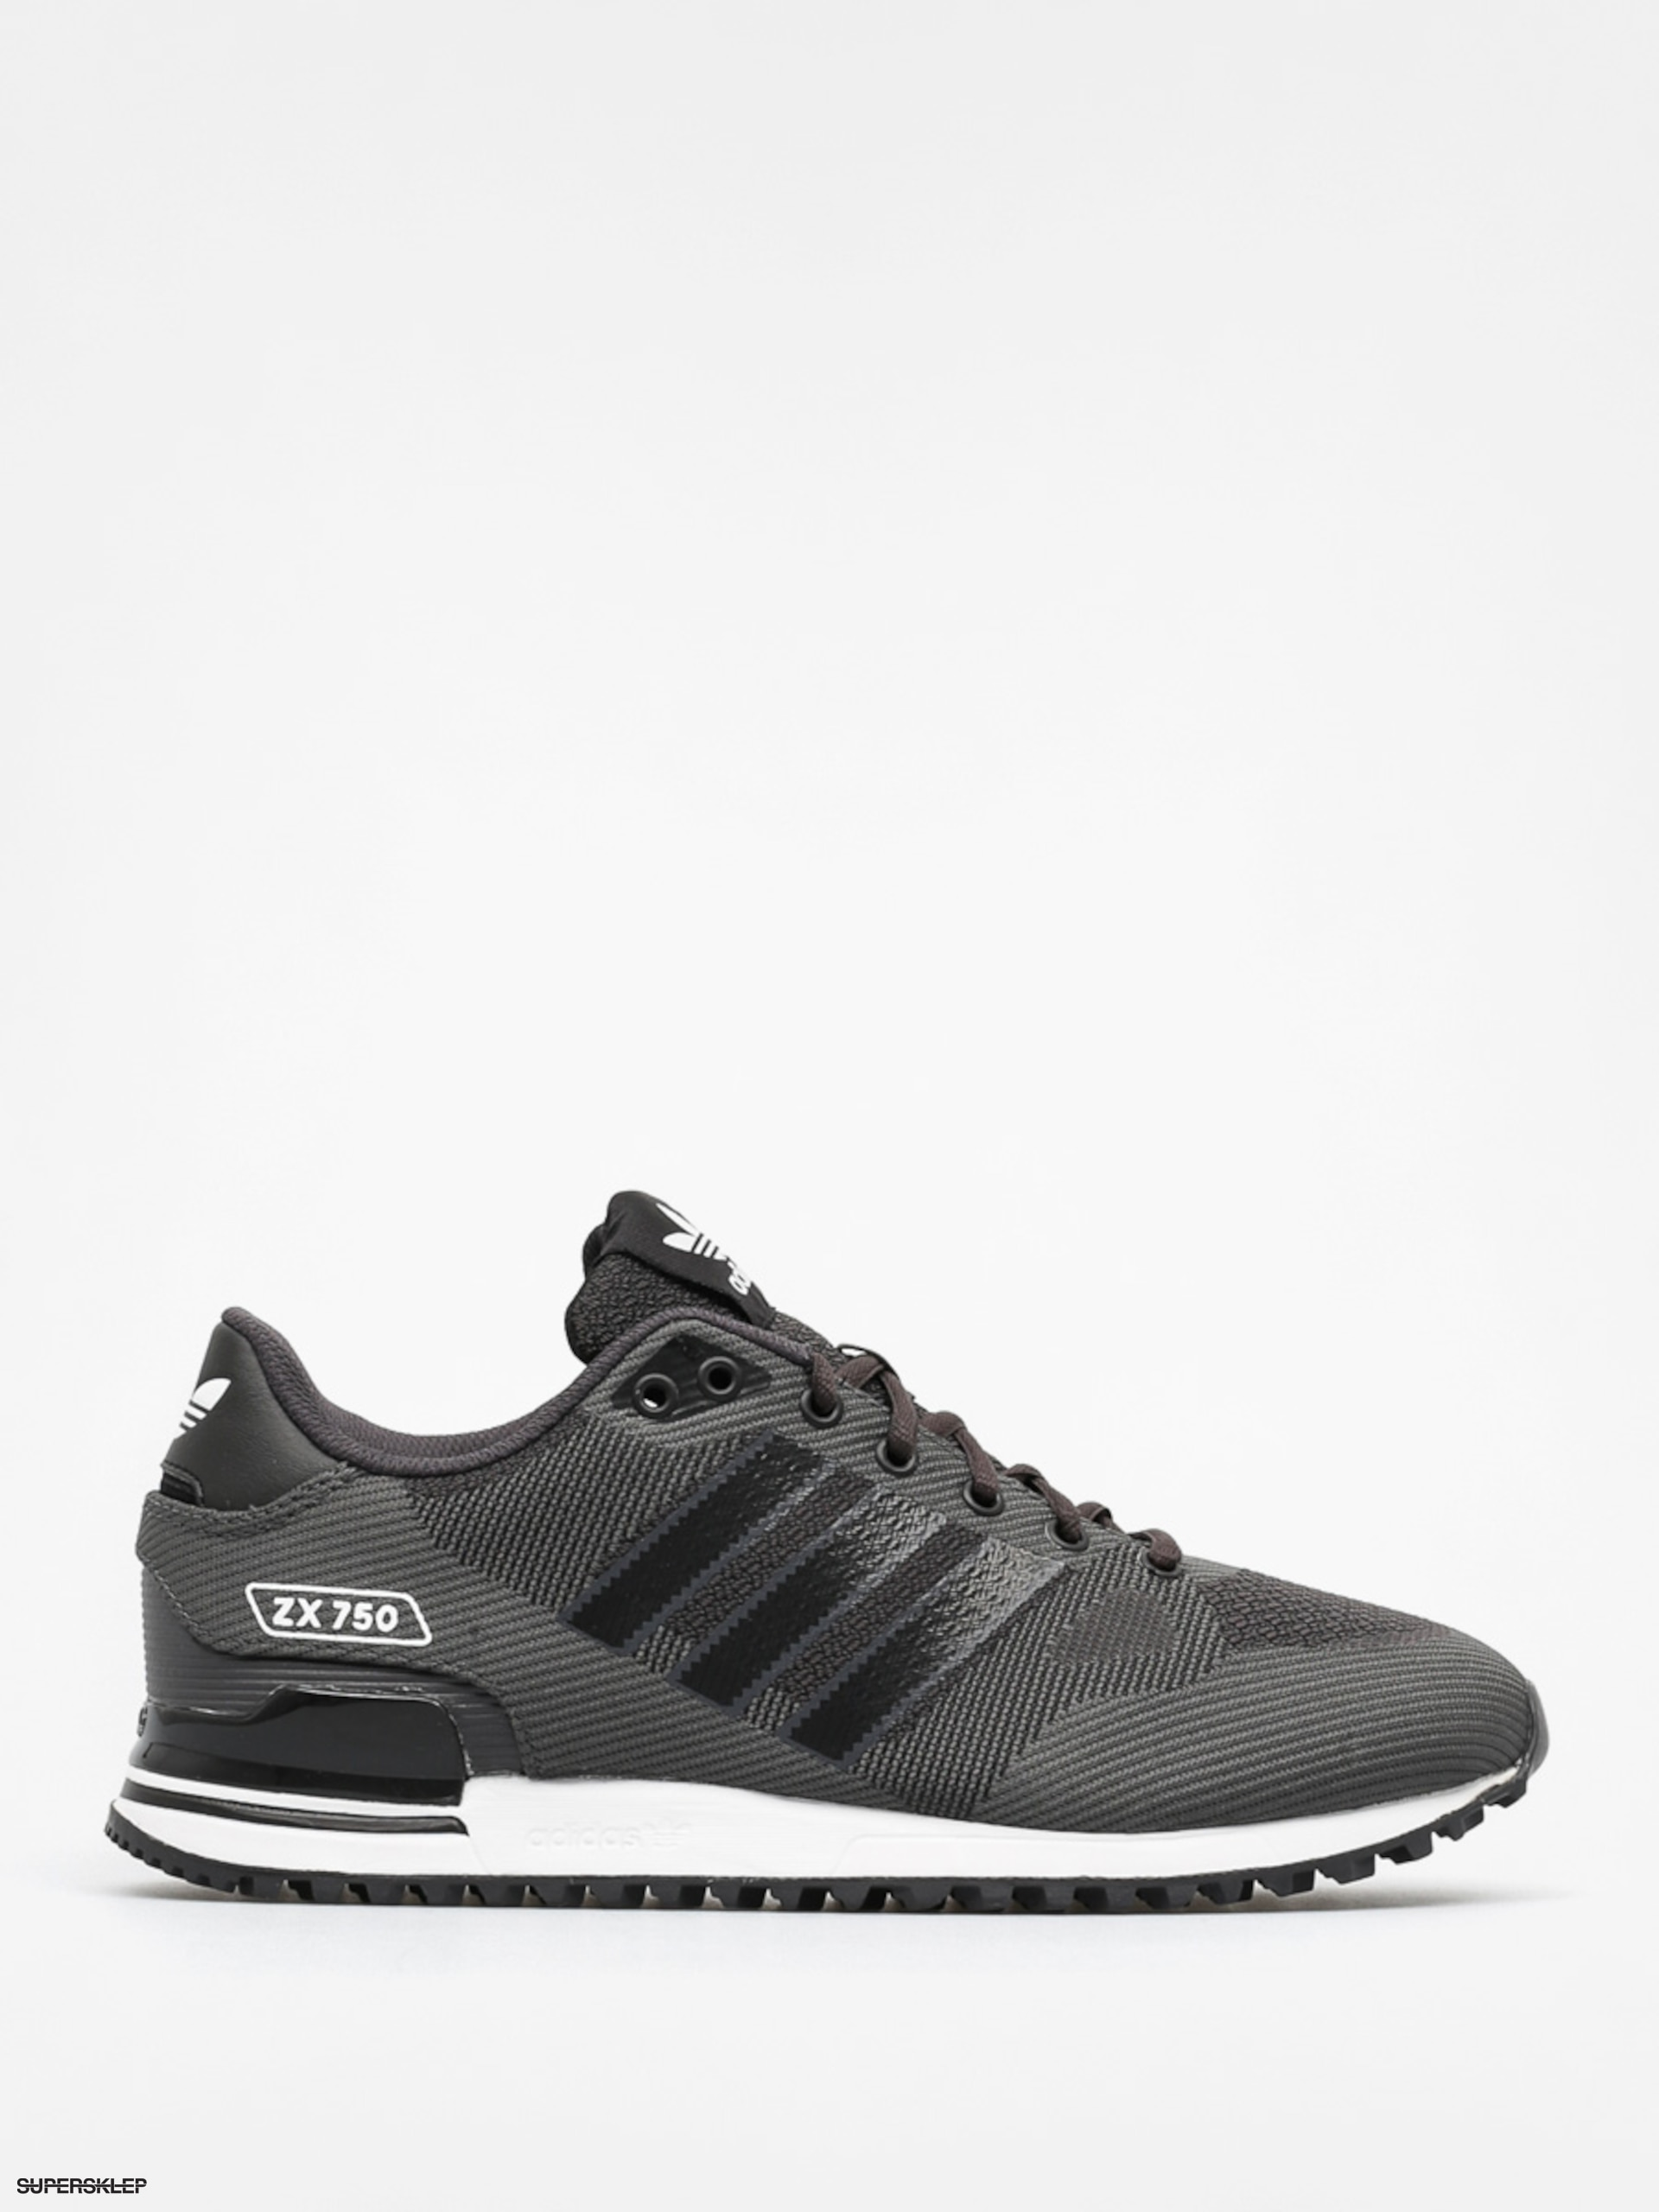 e2e308228 greece sneaker store 5da65 38b5c buty adidas zx 750 wv shalbkcblackftwwht  c1622 29970